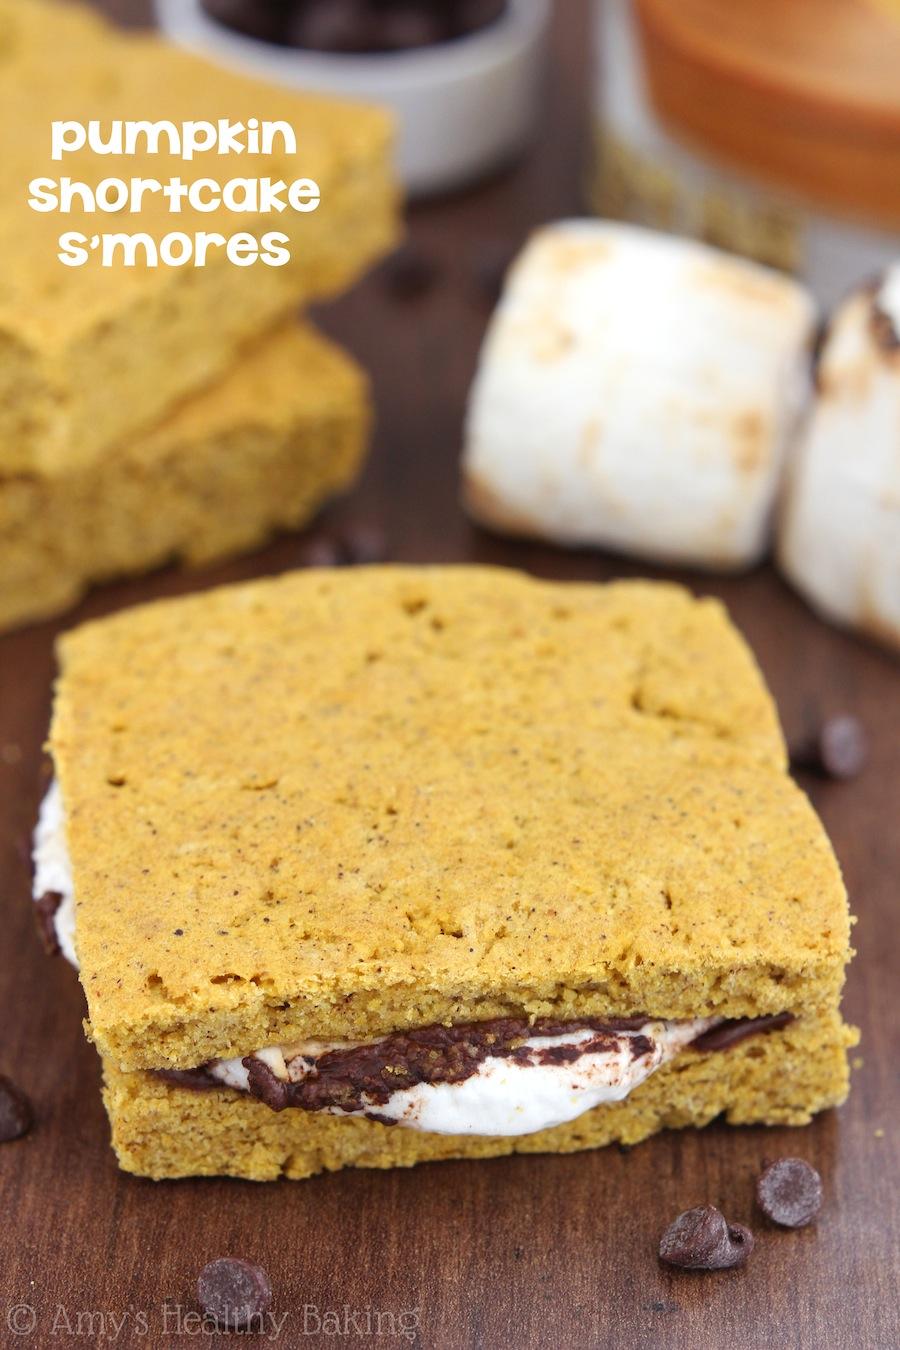 Pumpkin Shortcake S'mores